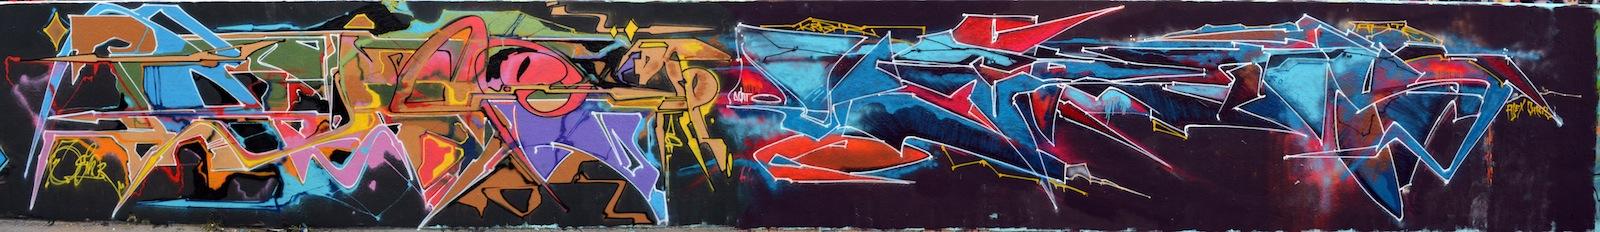 SenorKerts 27-03-2014